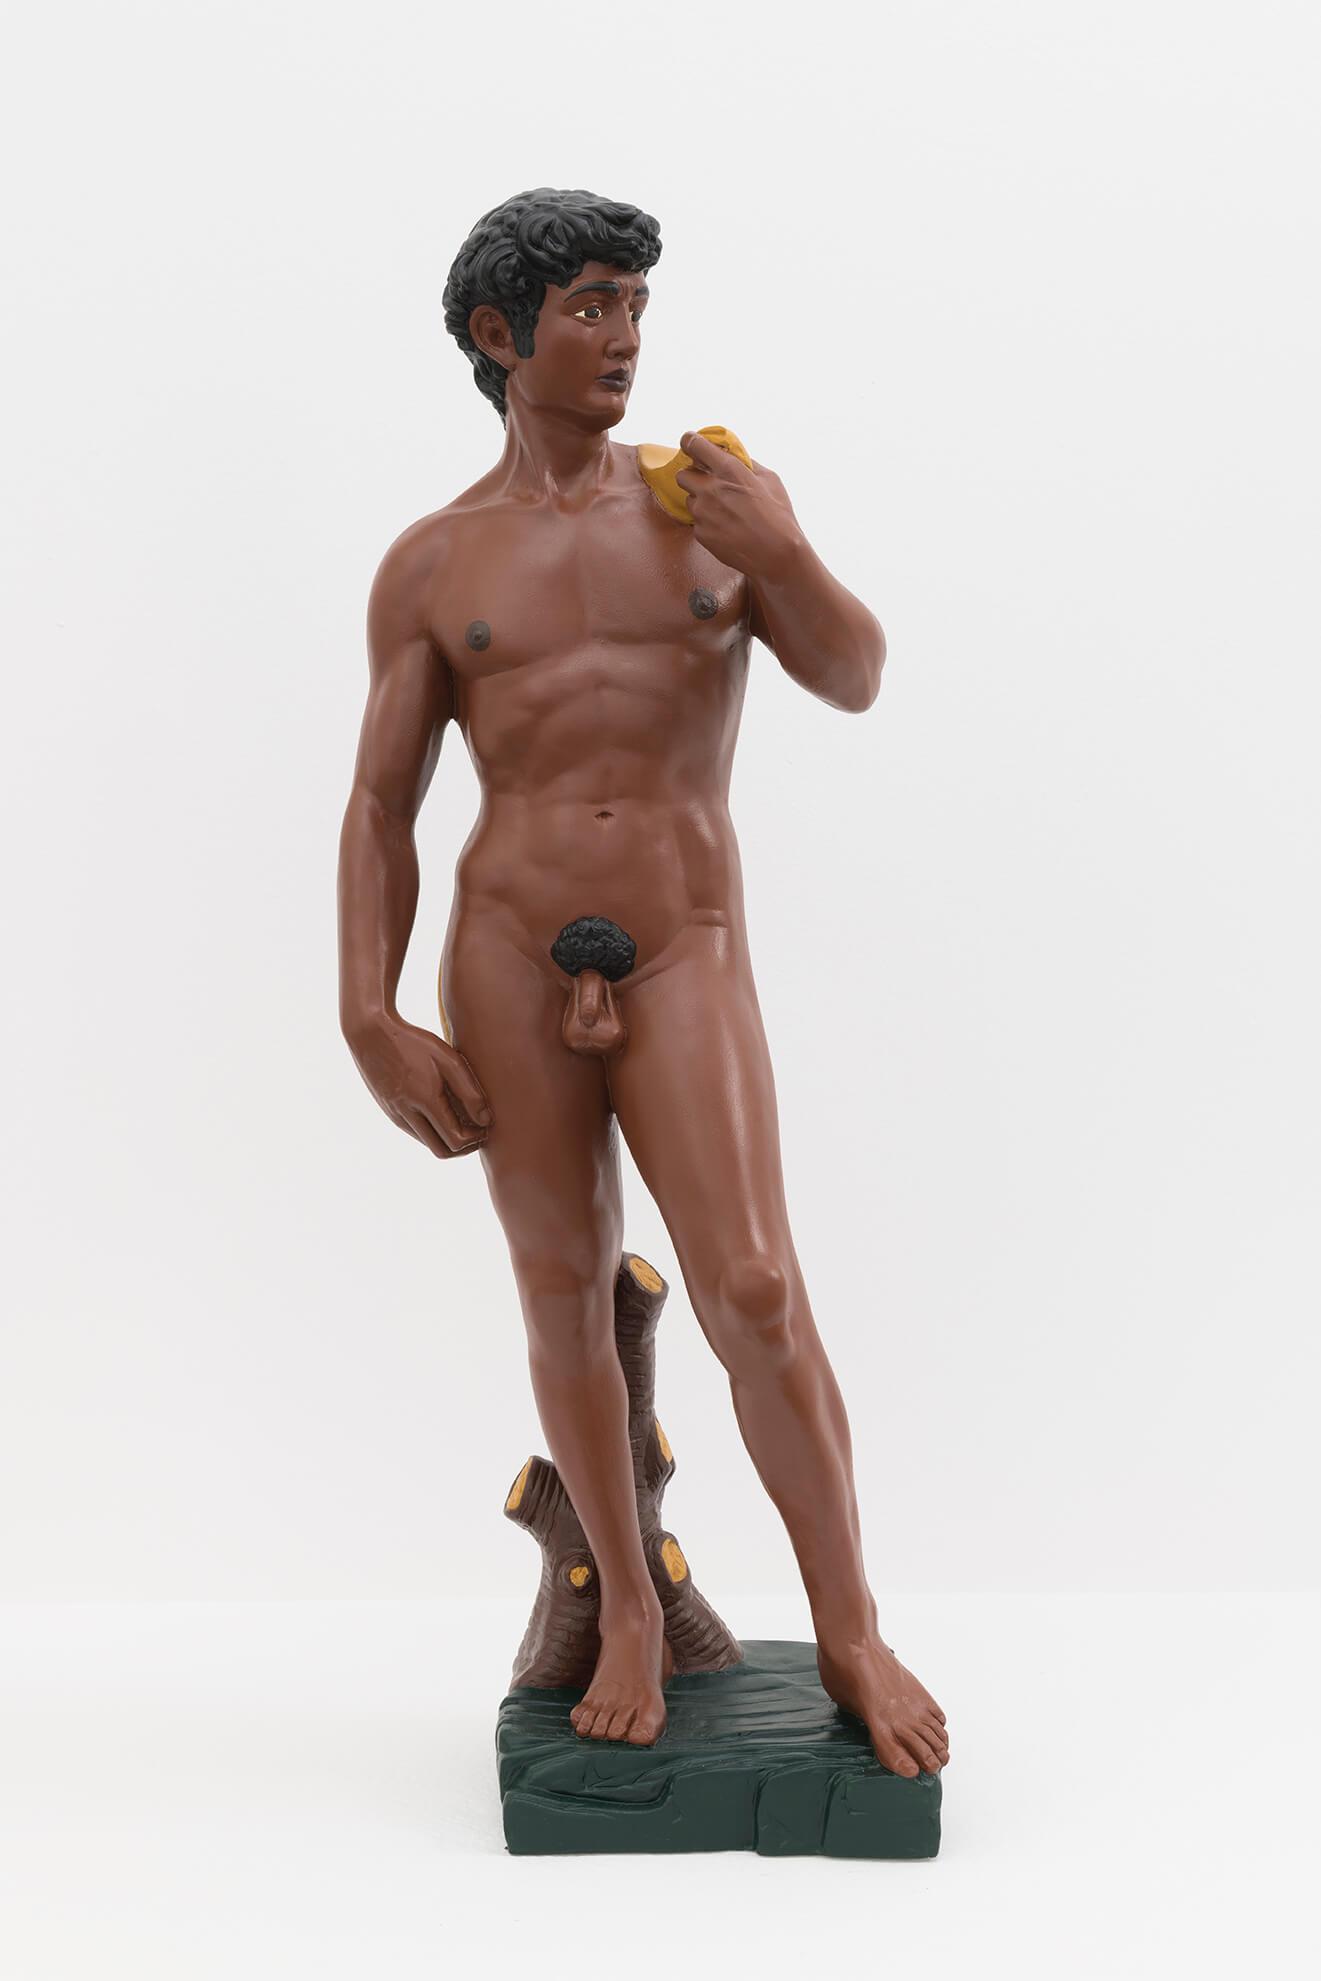 HANS-PETER FELDMANN. David (black), 2008 | El Museu Imaginari / El Museo Imaginario / The Imaginary Museum | ProjecteSD